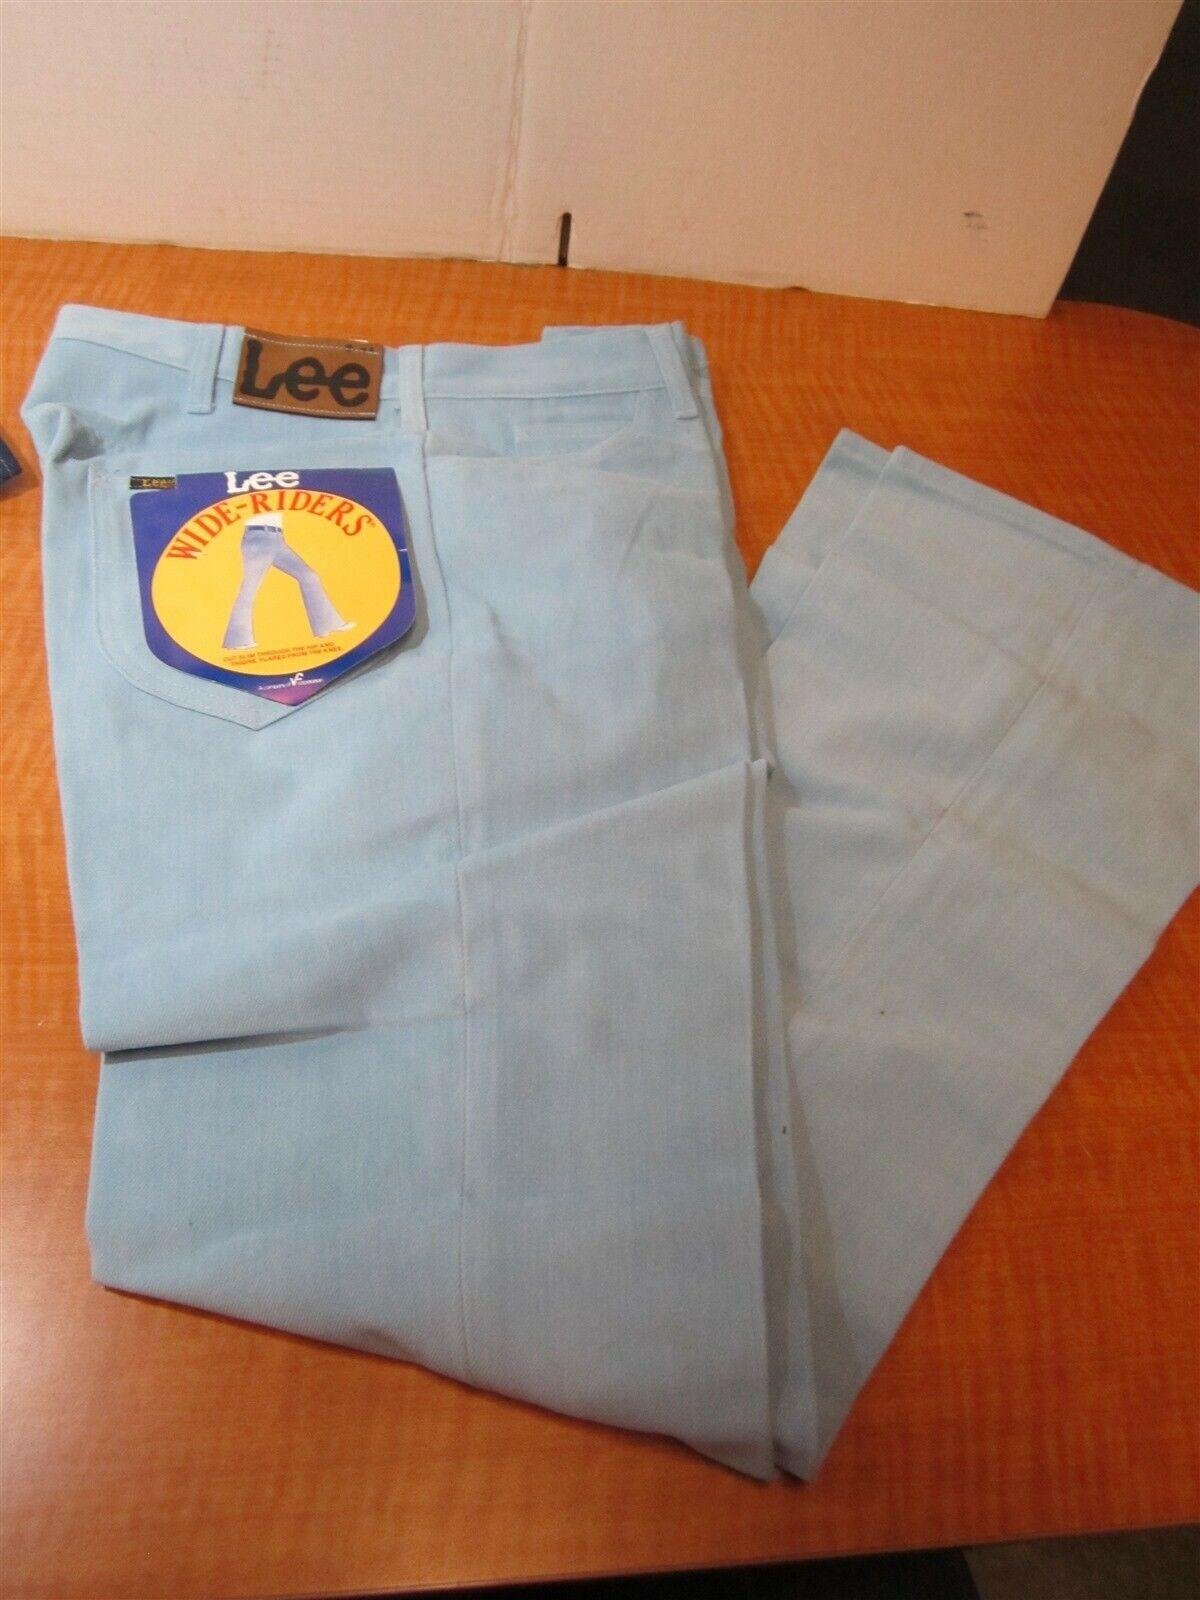 Lee Womens Vintage Light bluee Wide Denim Rider Jeans Size  33x36 USA MADE